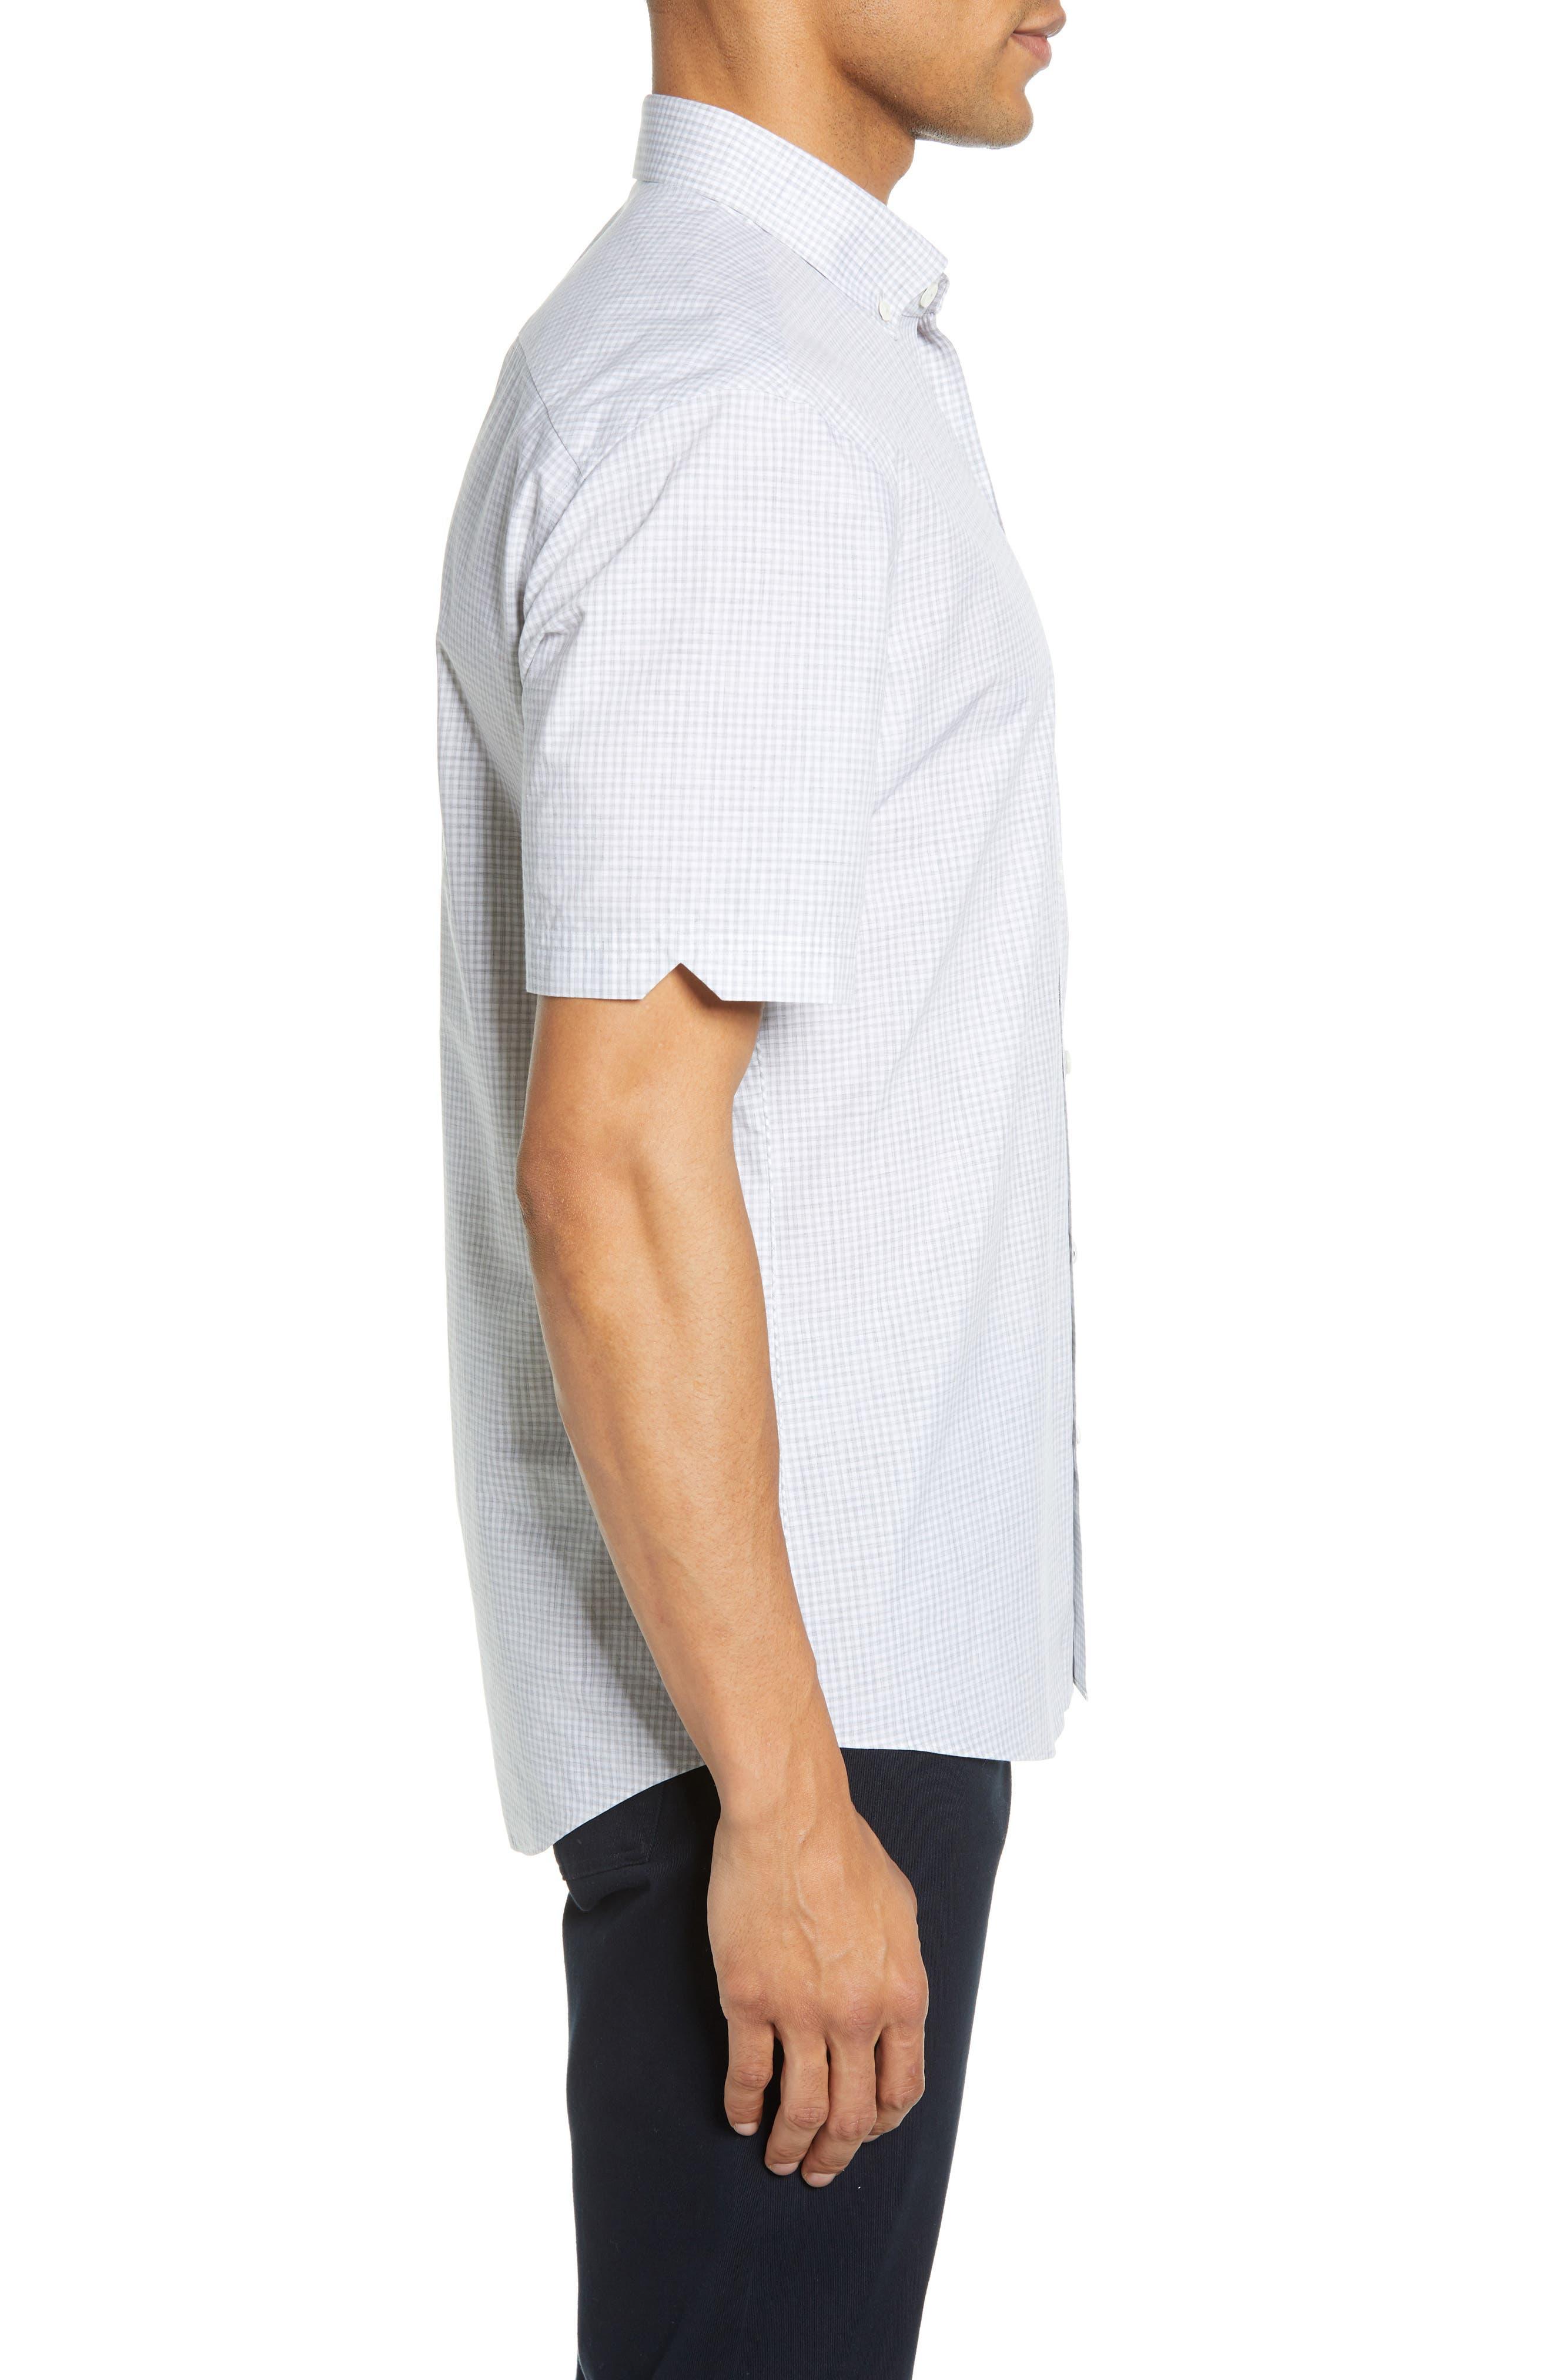 ZACHARY PRELL, Cechini Regular Fit Short Sleeve Sport Shirt, Alternate thumbnail 4, color, LT GREY